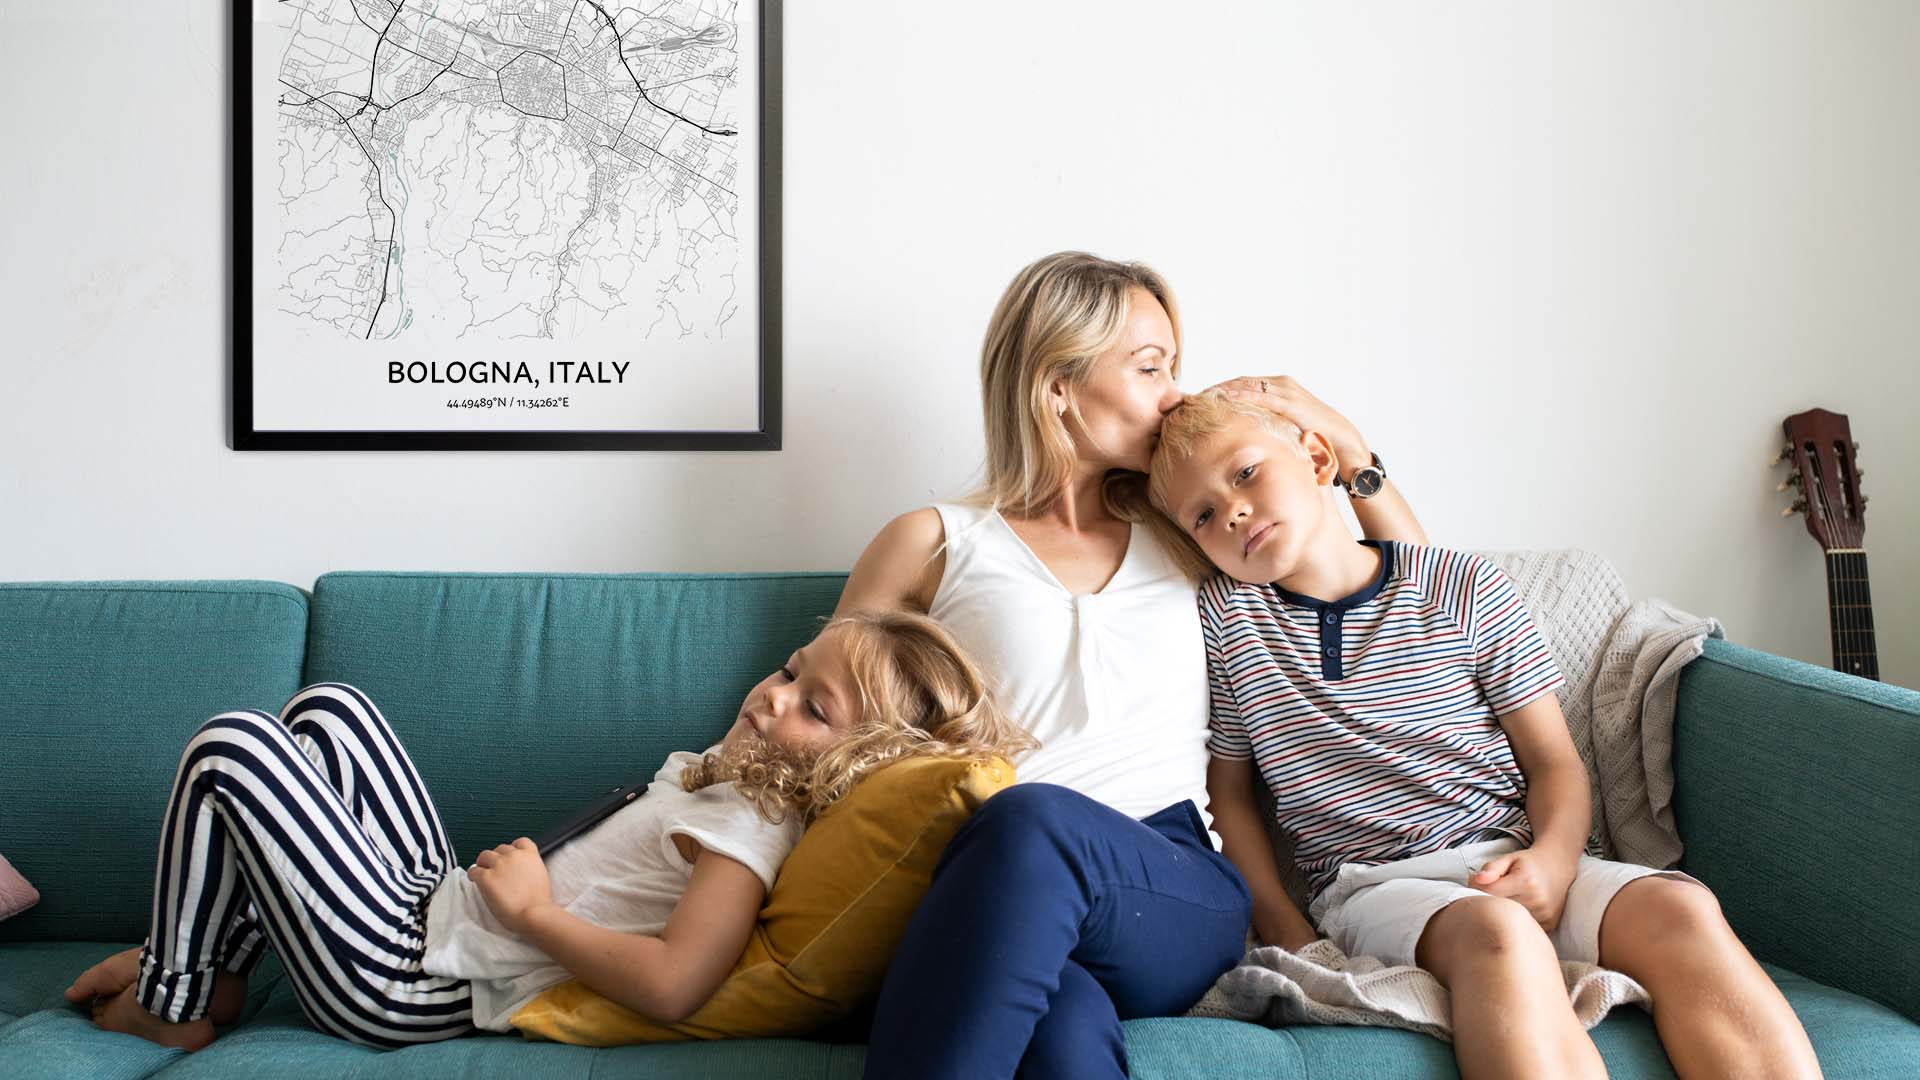 Bologna map poster